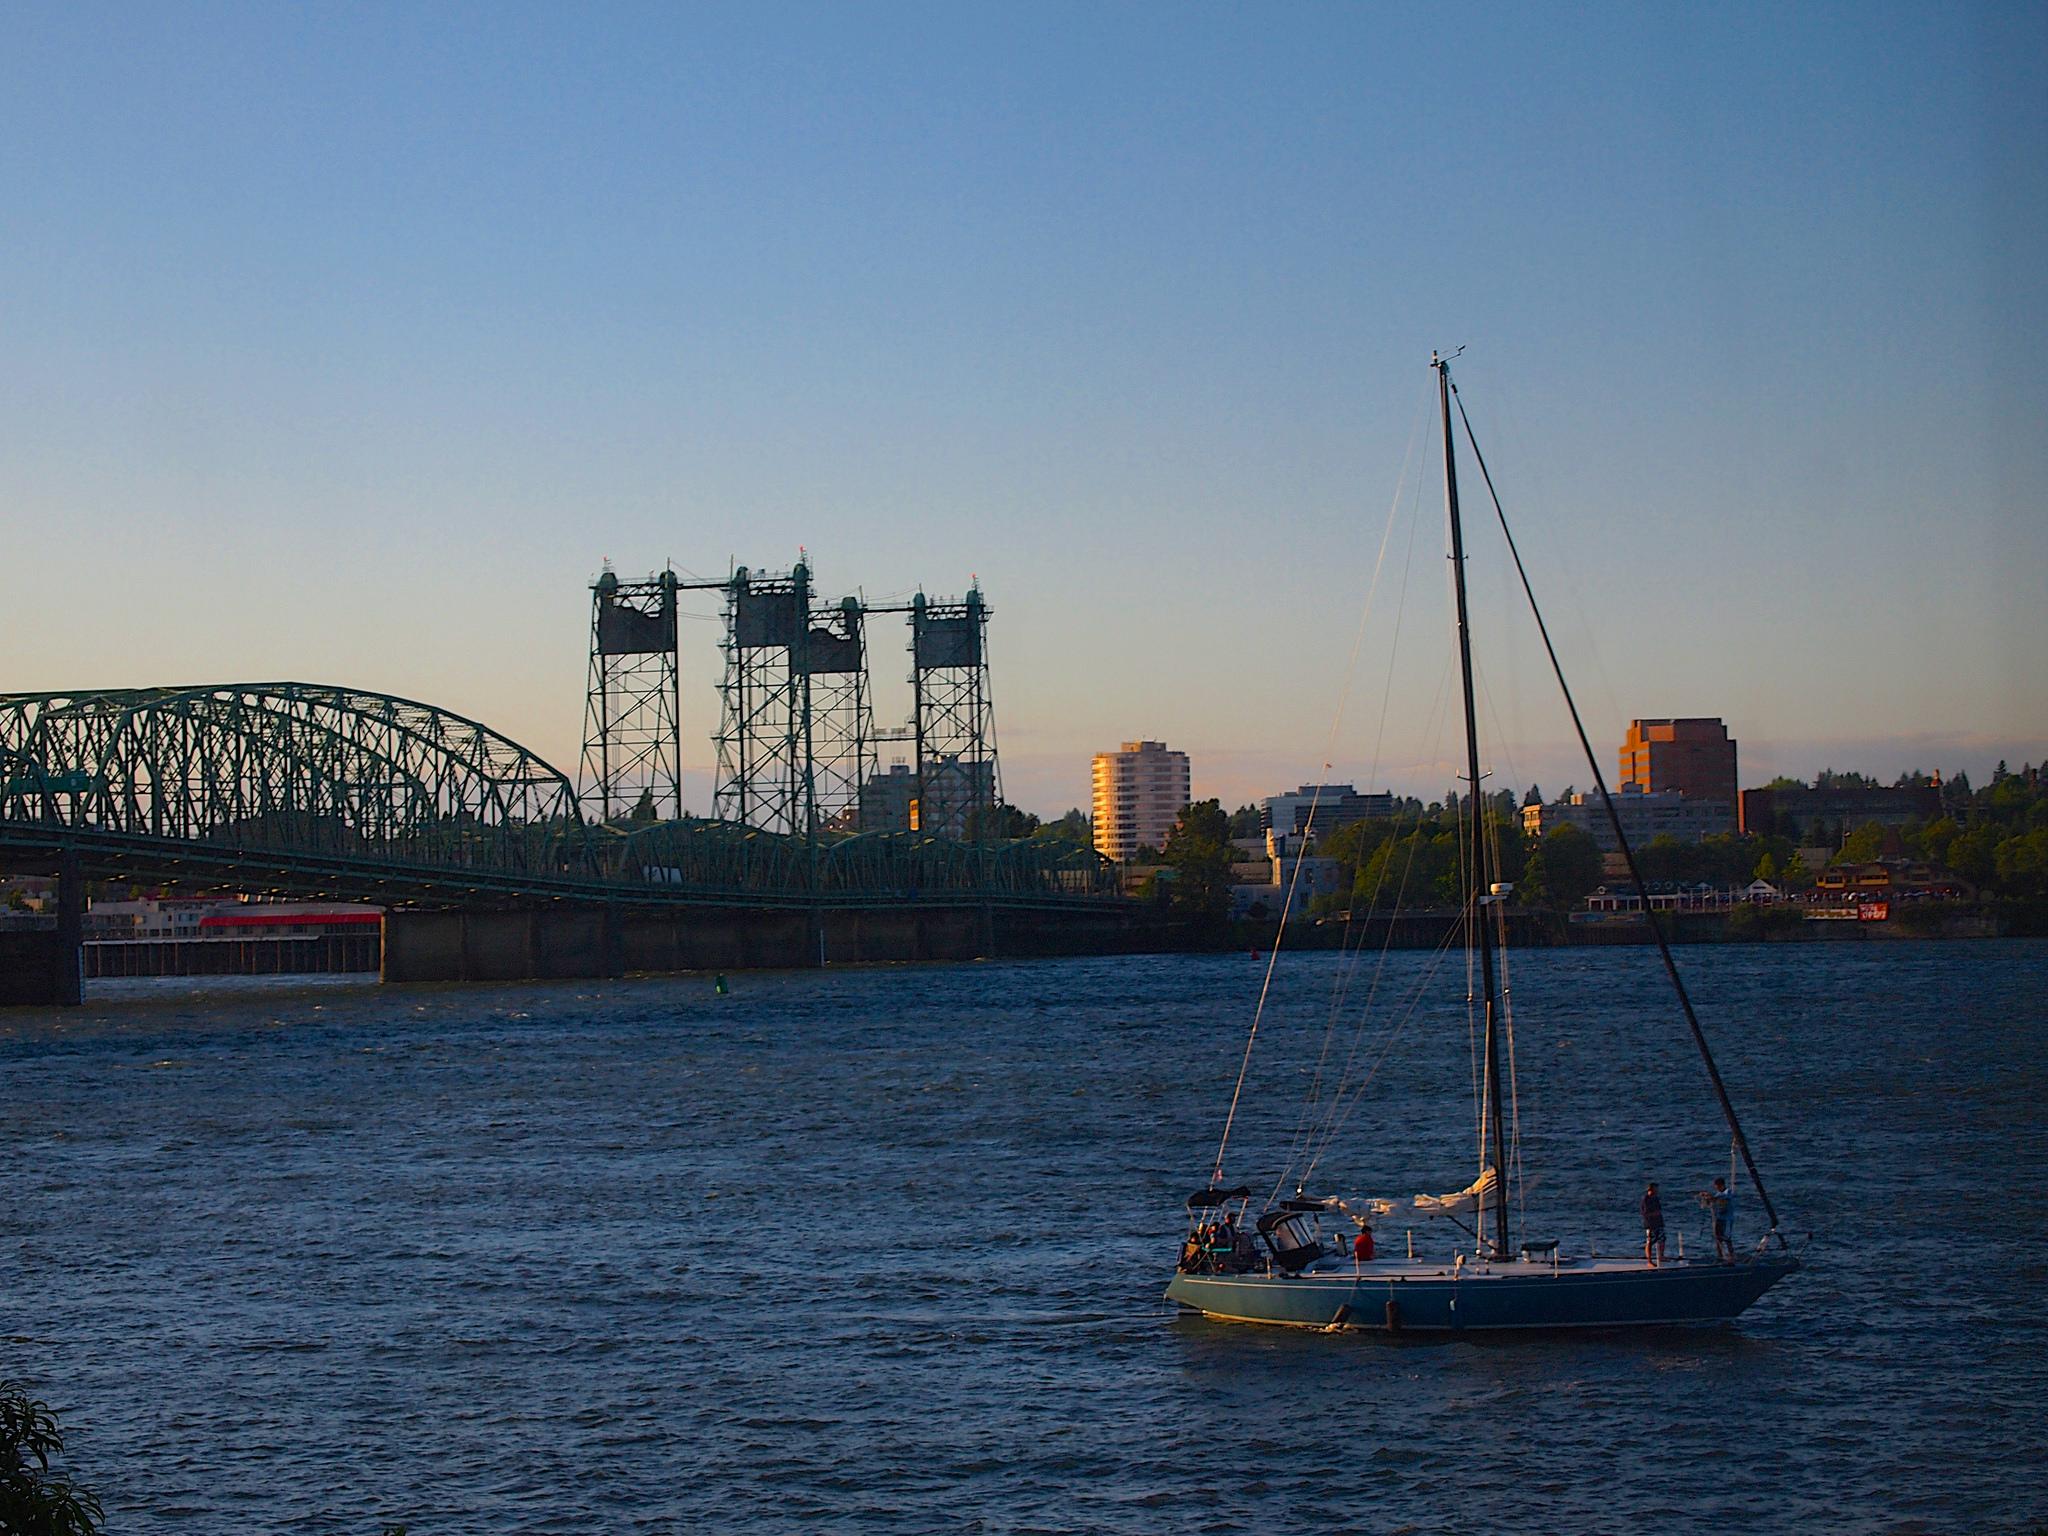 Sailboat on Columbia River   ©Sarah Sammis/Flickr